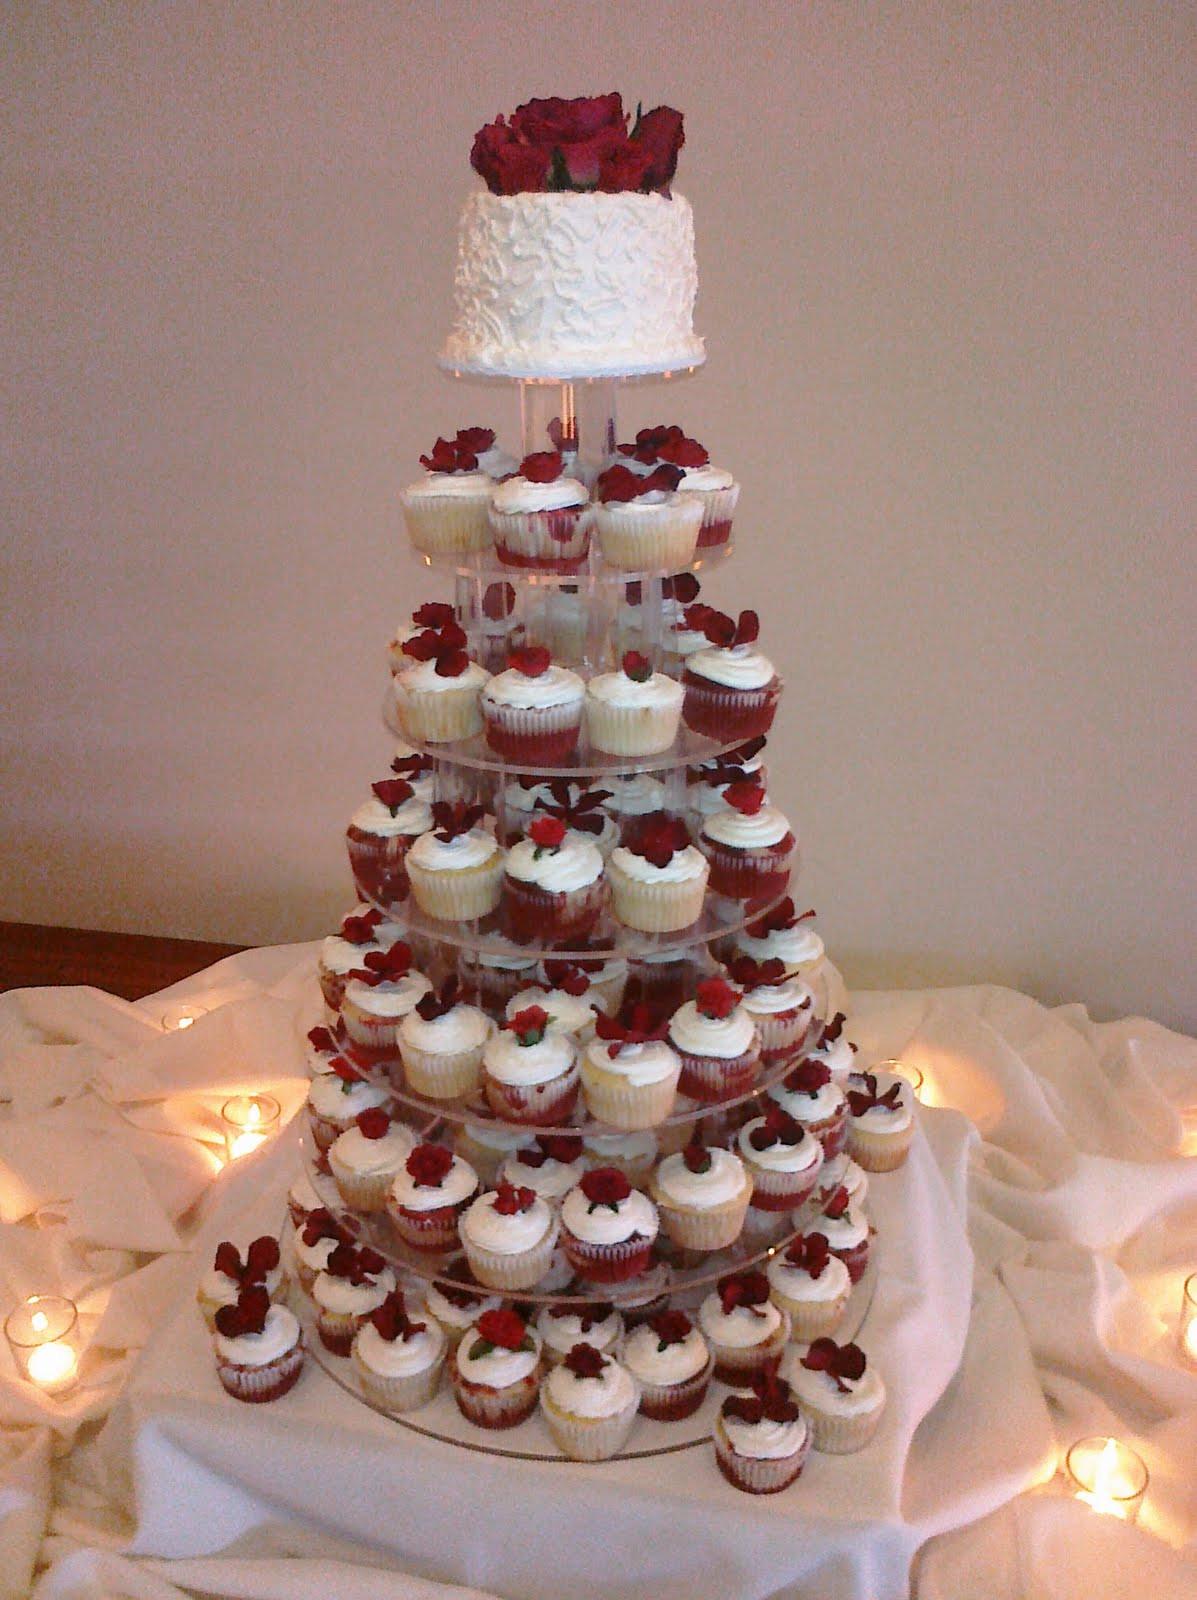 Safeway Wedding Cakes  Safeway Wedding Cake A safe way to retain elegance